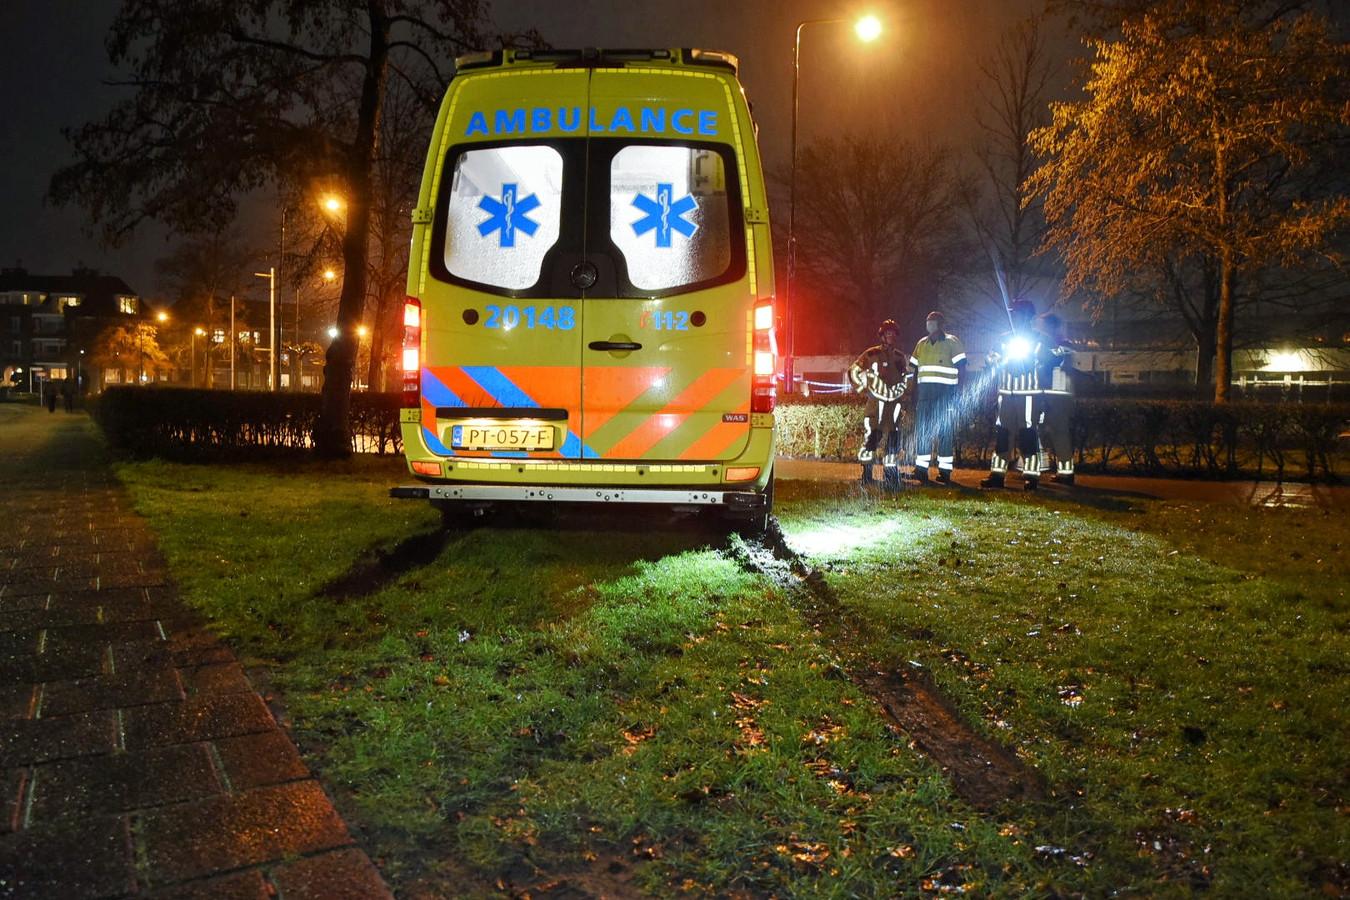 Ambulance rijdt zich vast op grasveld in Oisterwijk.